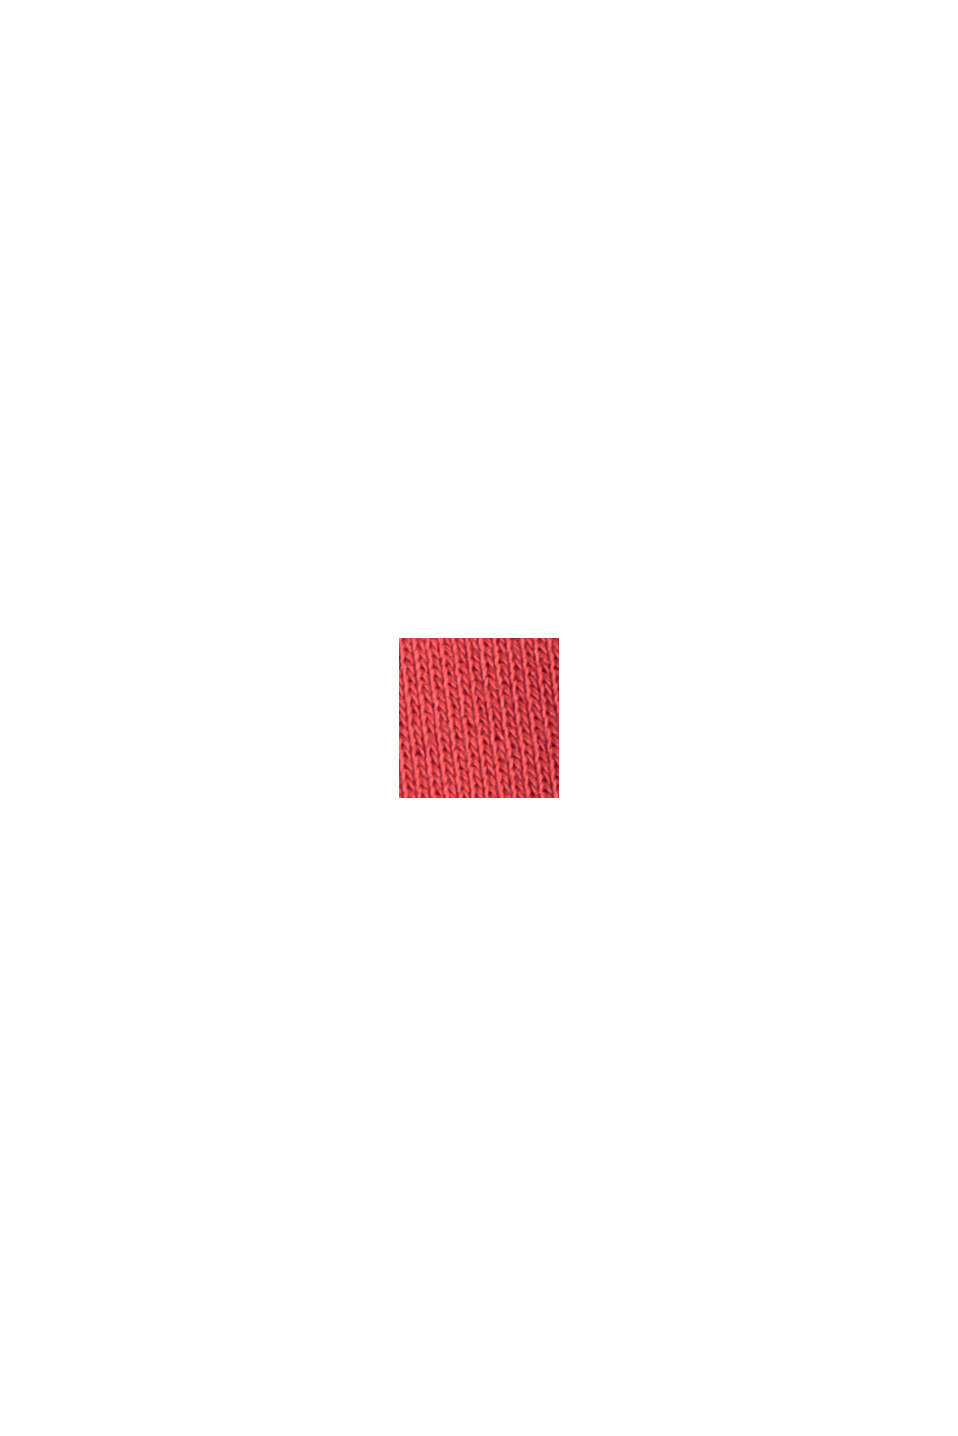 Sweat-shirt 100% coton biologique, RED, swatch